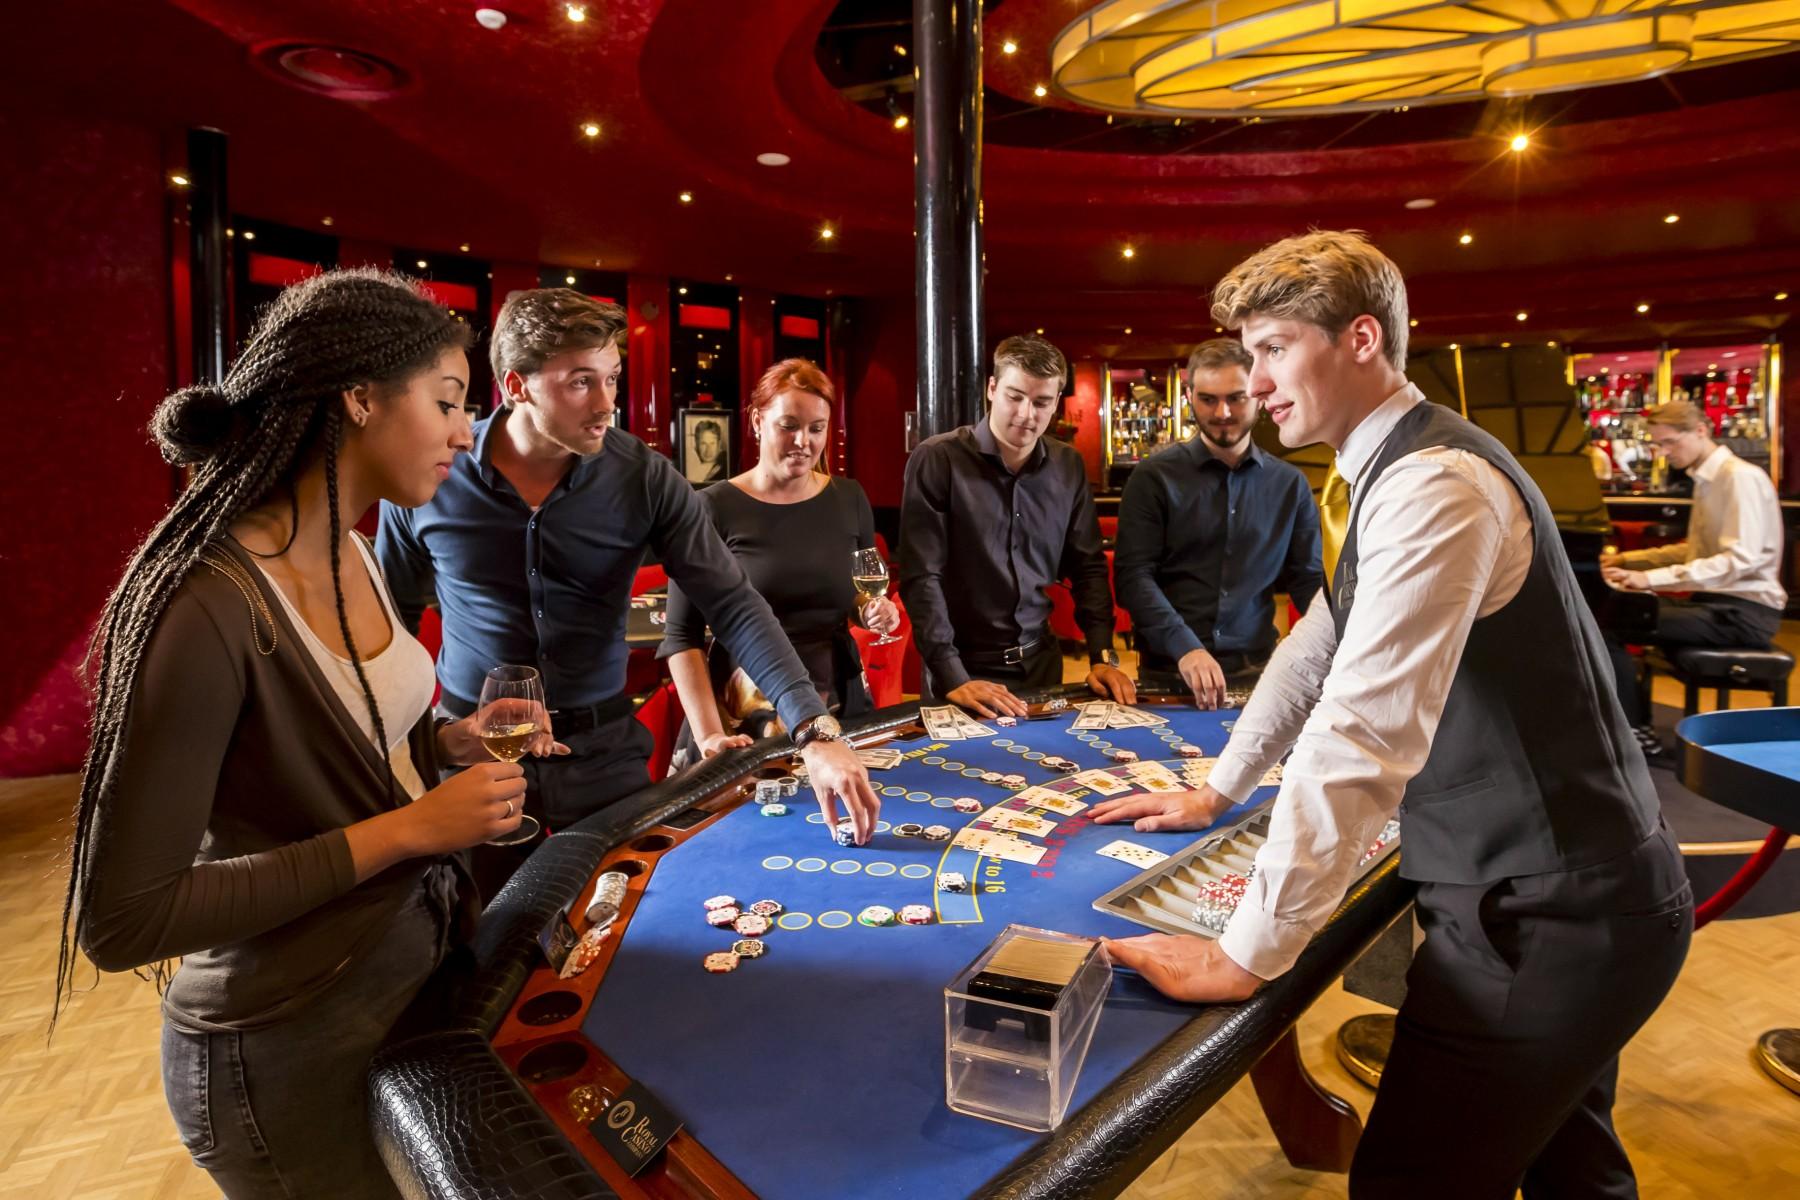 Android casino slots